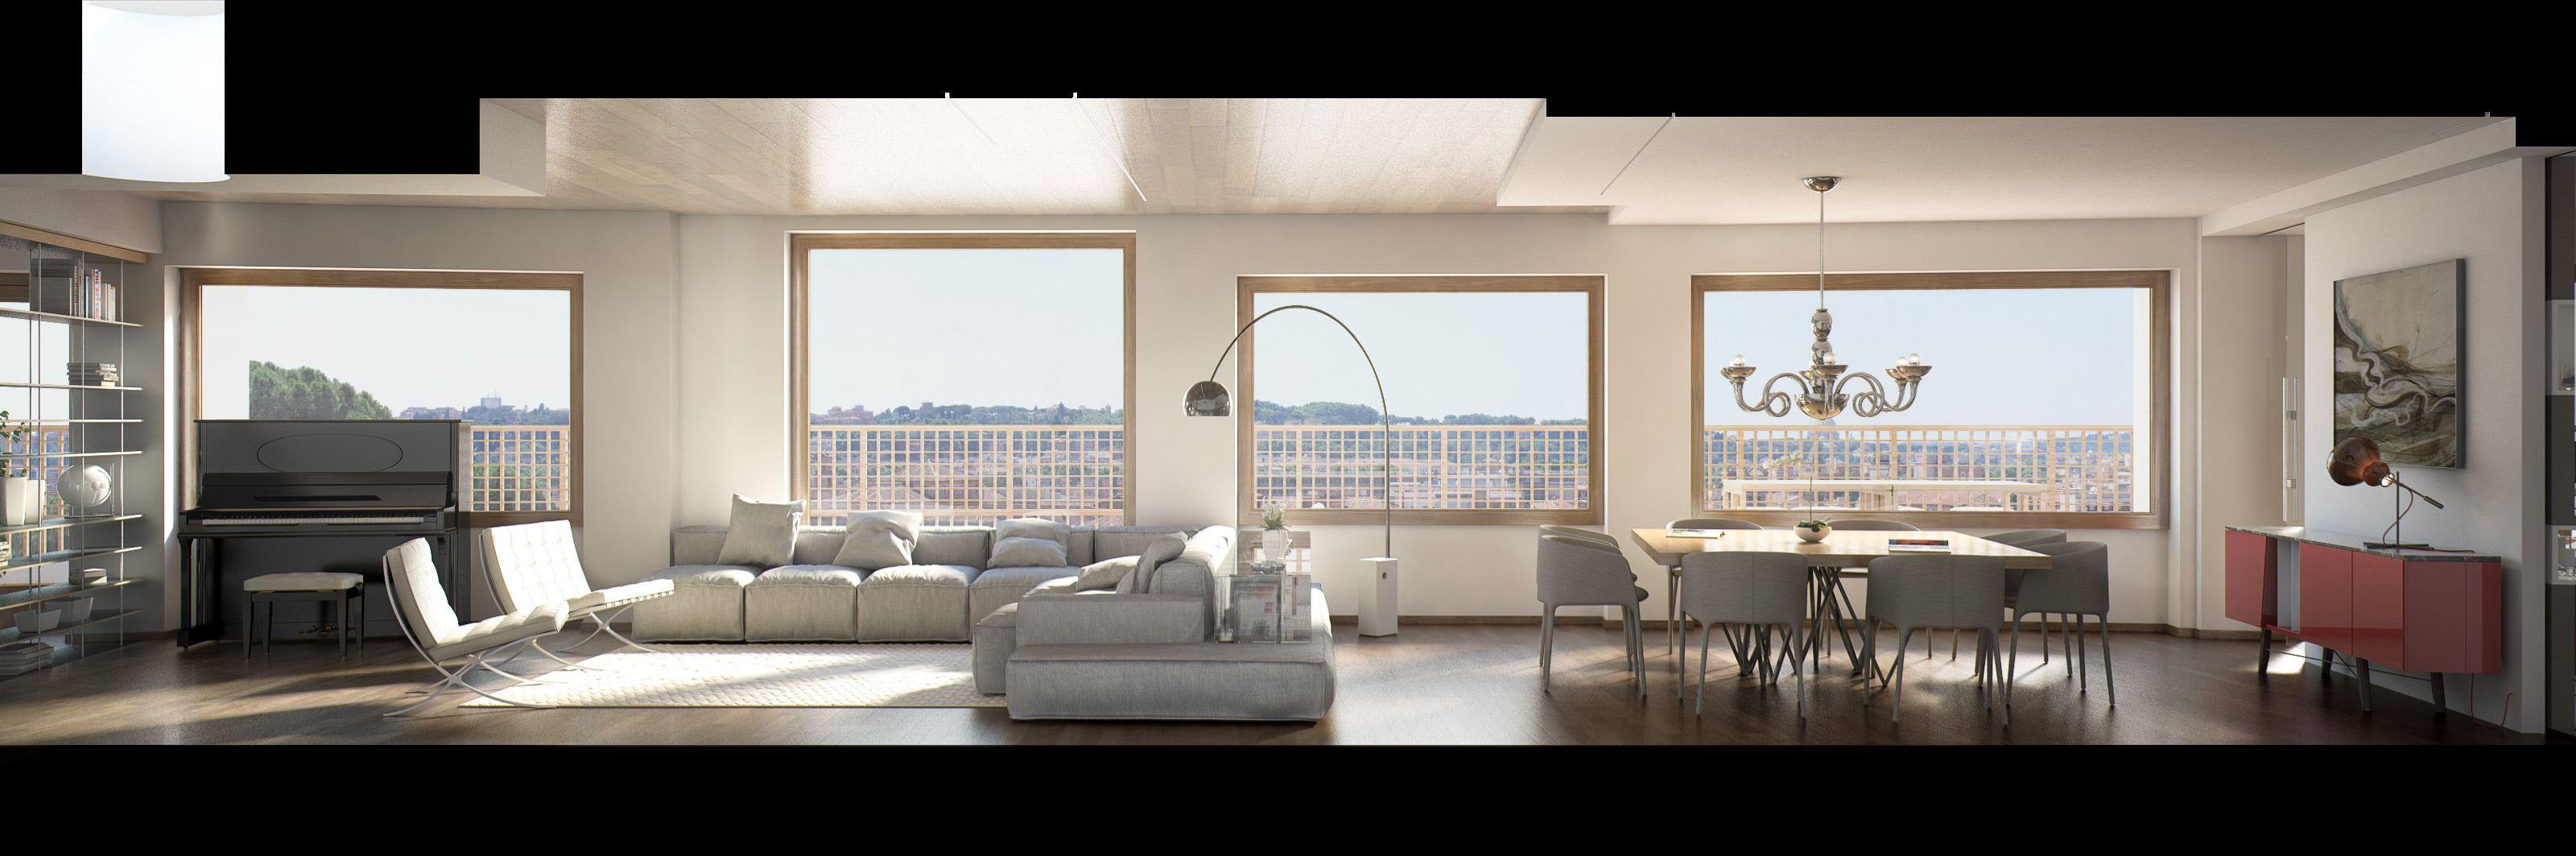 Render di un open space moderno con zona relax e sala da pranzo ...